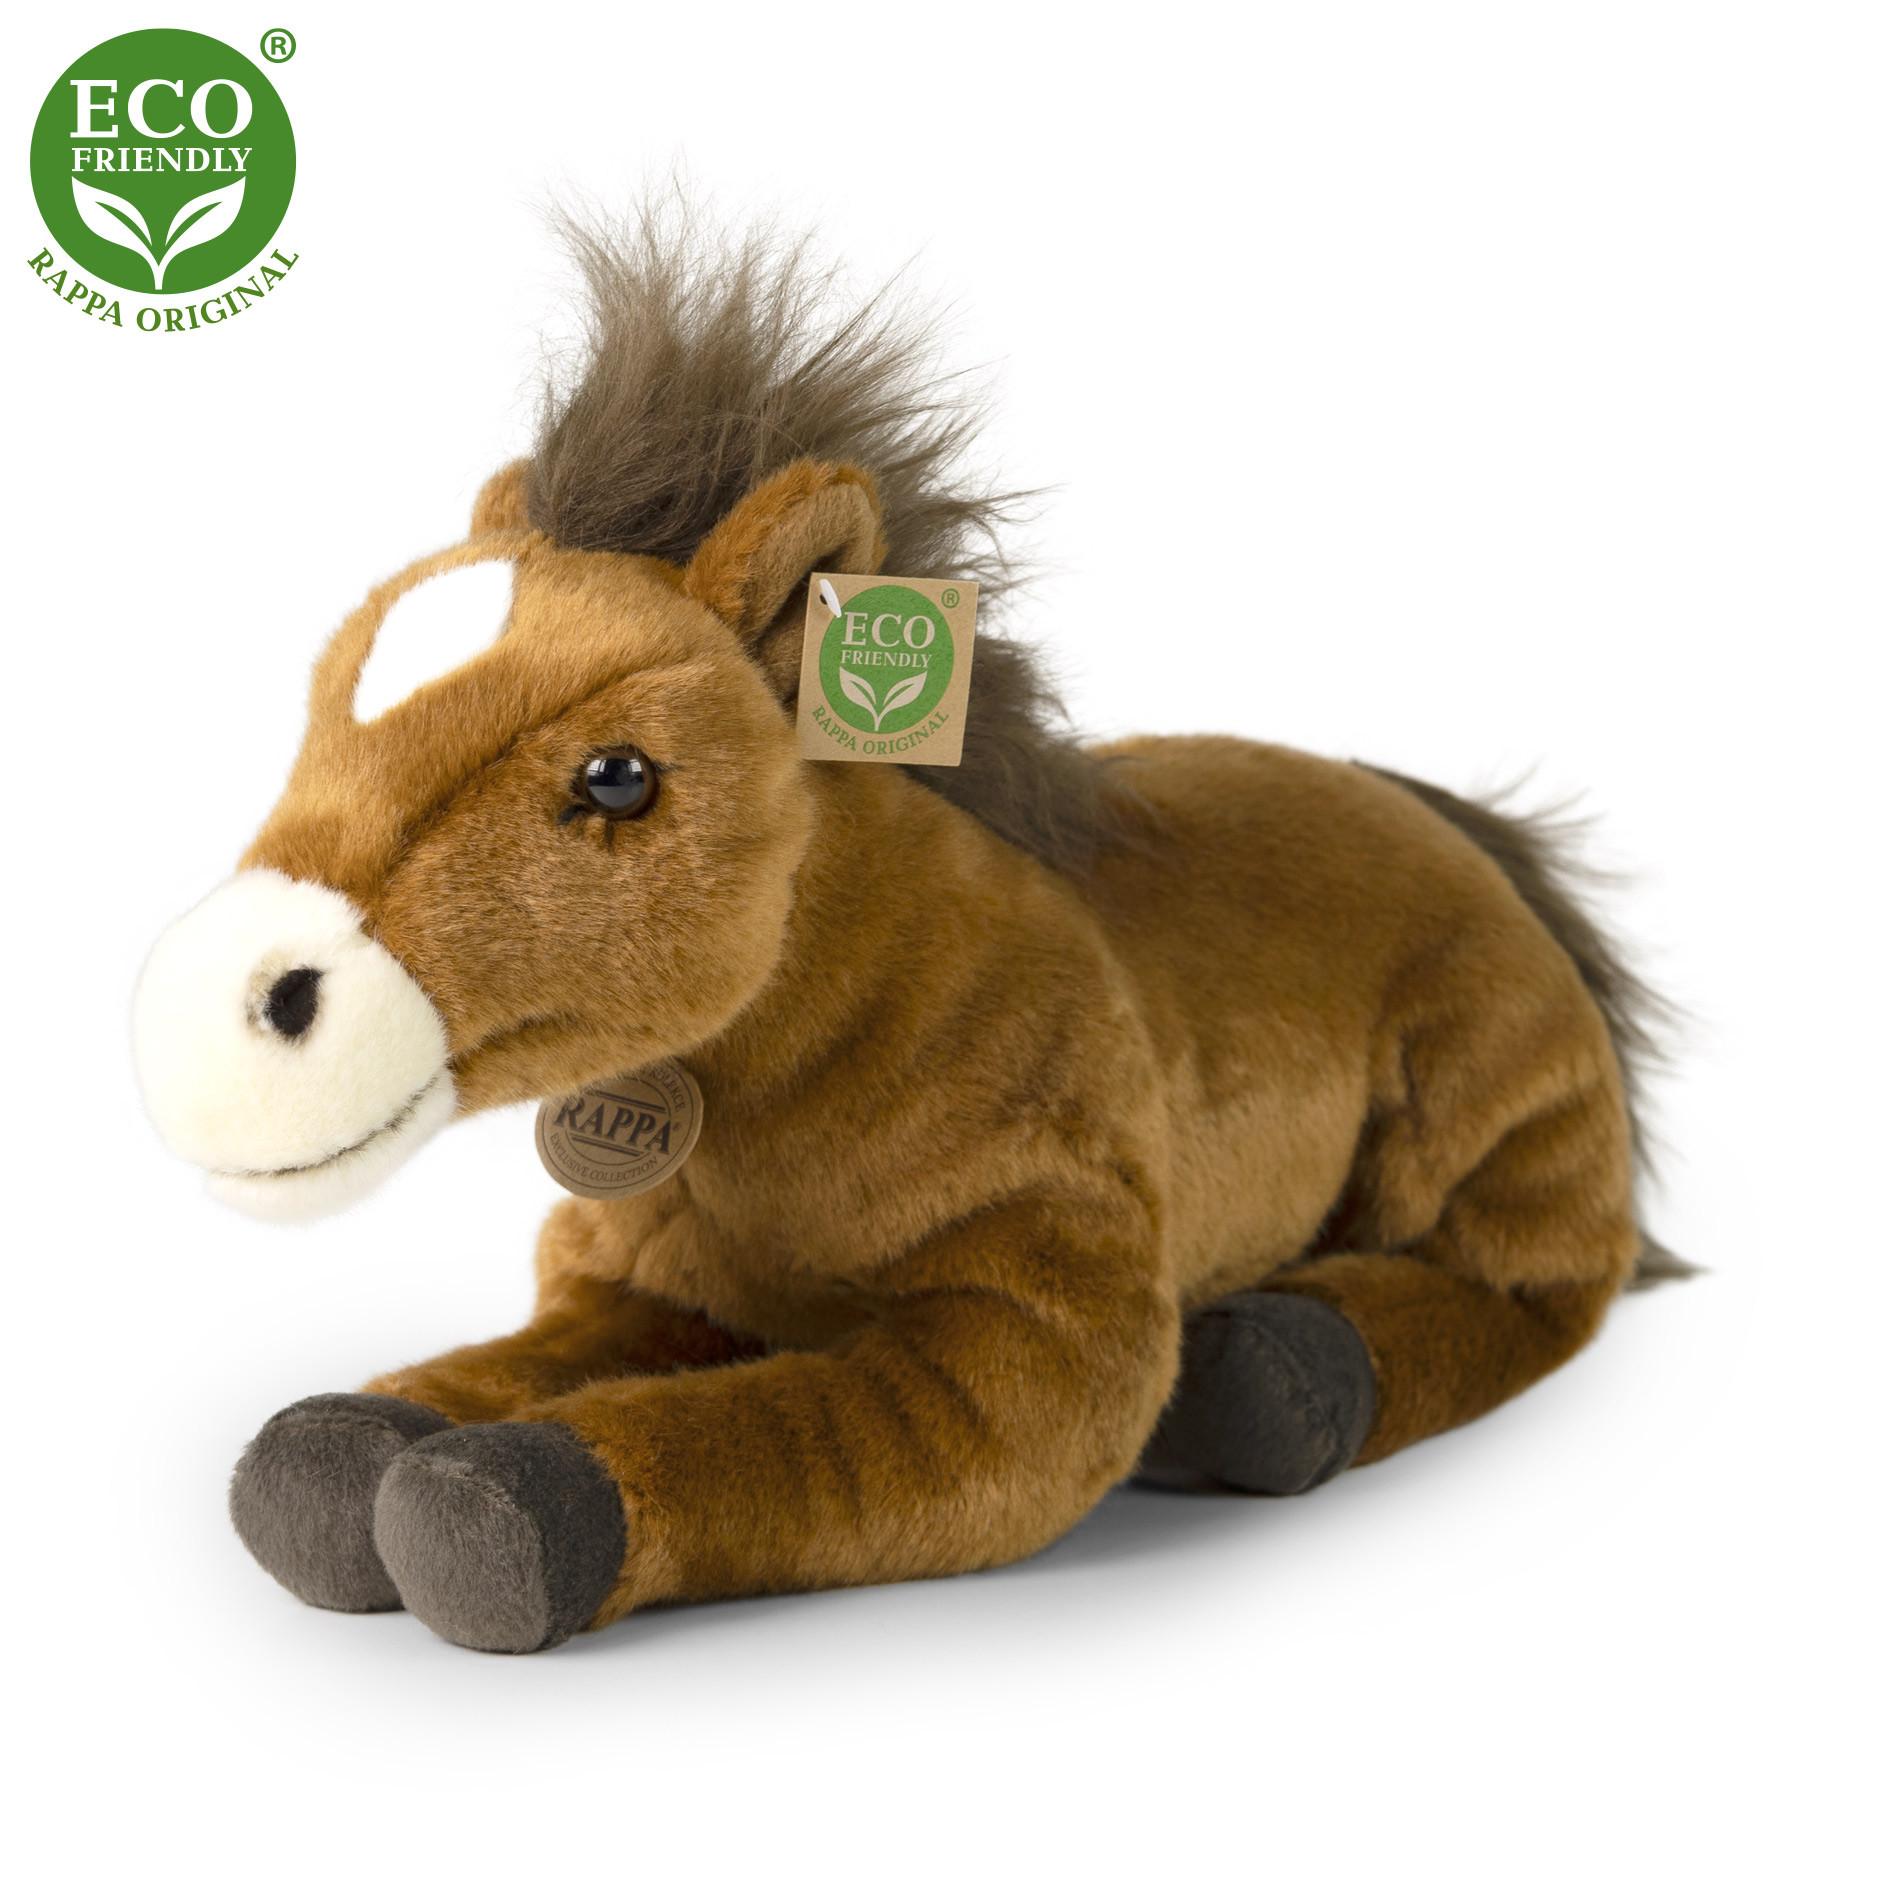 the plush horse lying, 35 cm